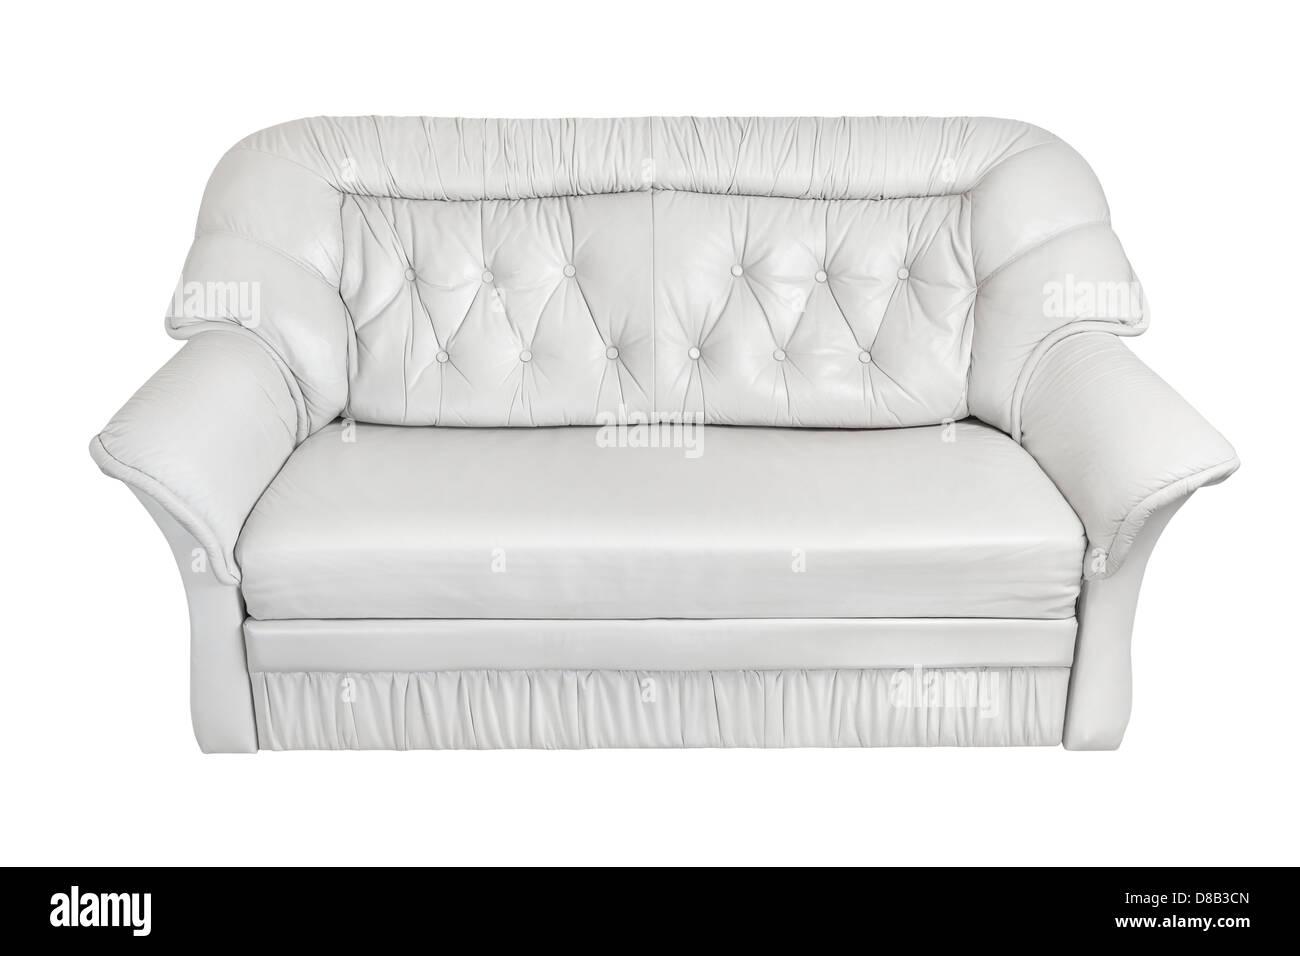 Canapé cuir blanc sur fond blanc Photo Stock